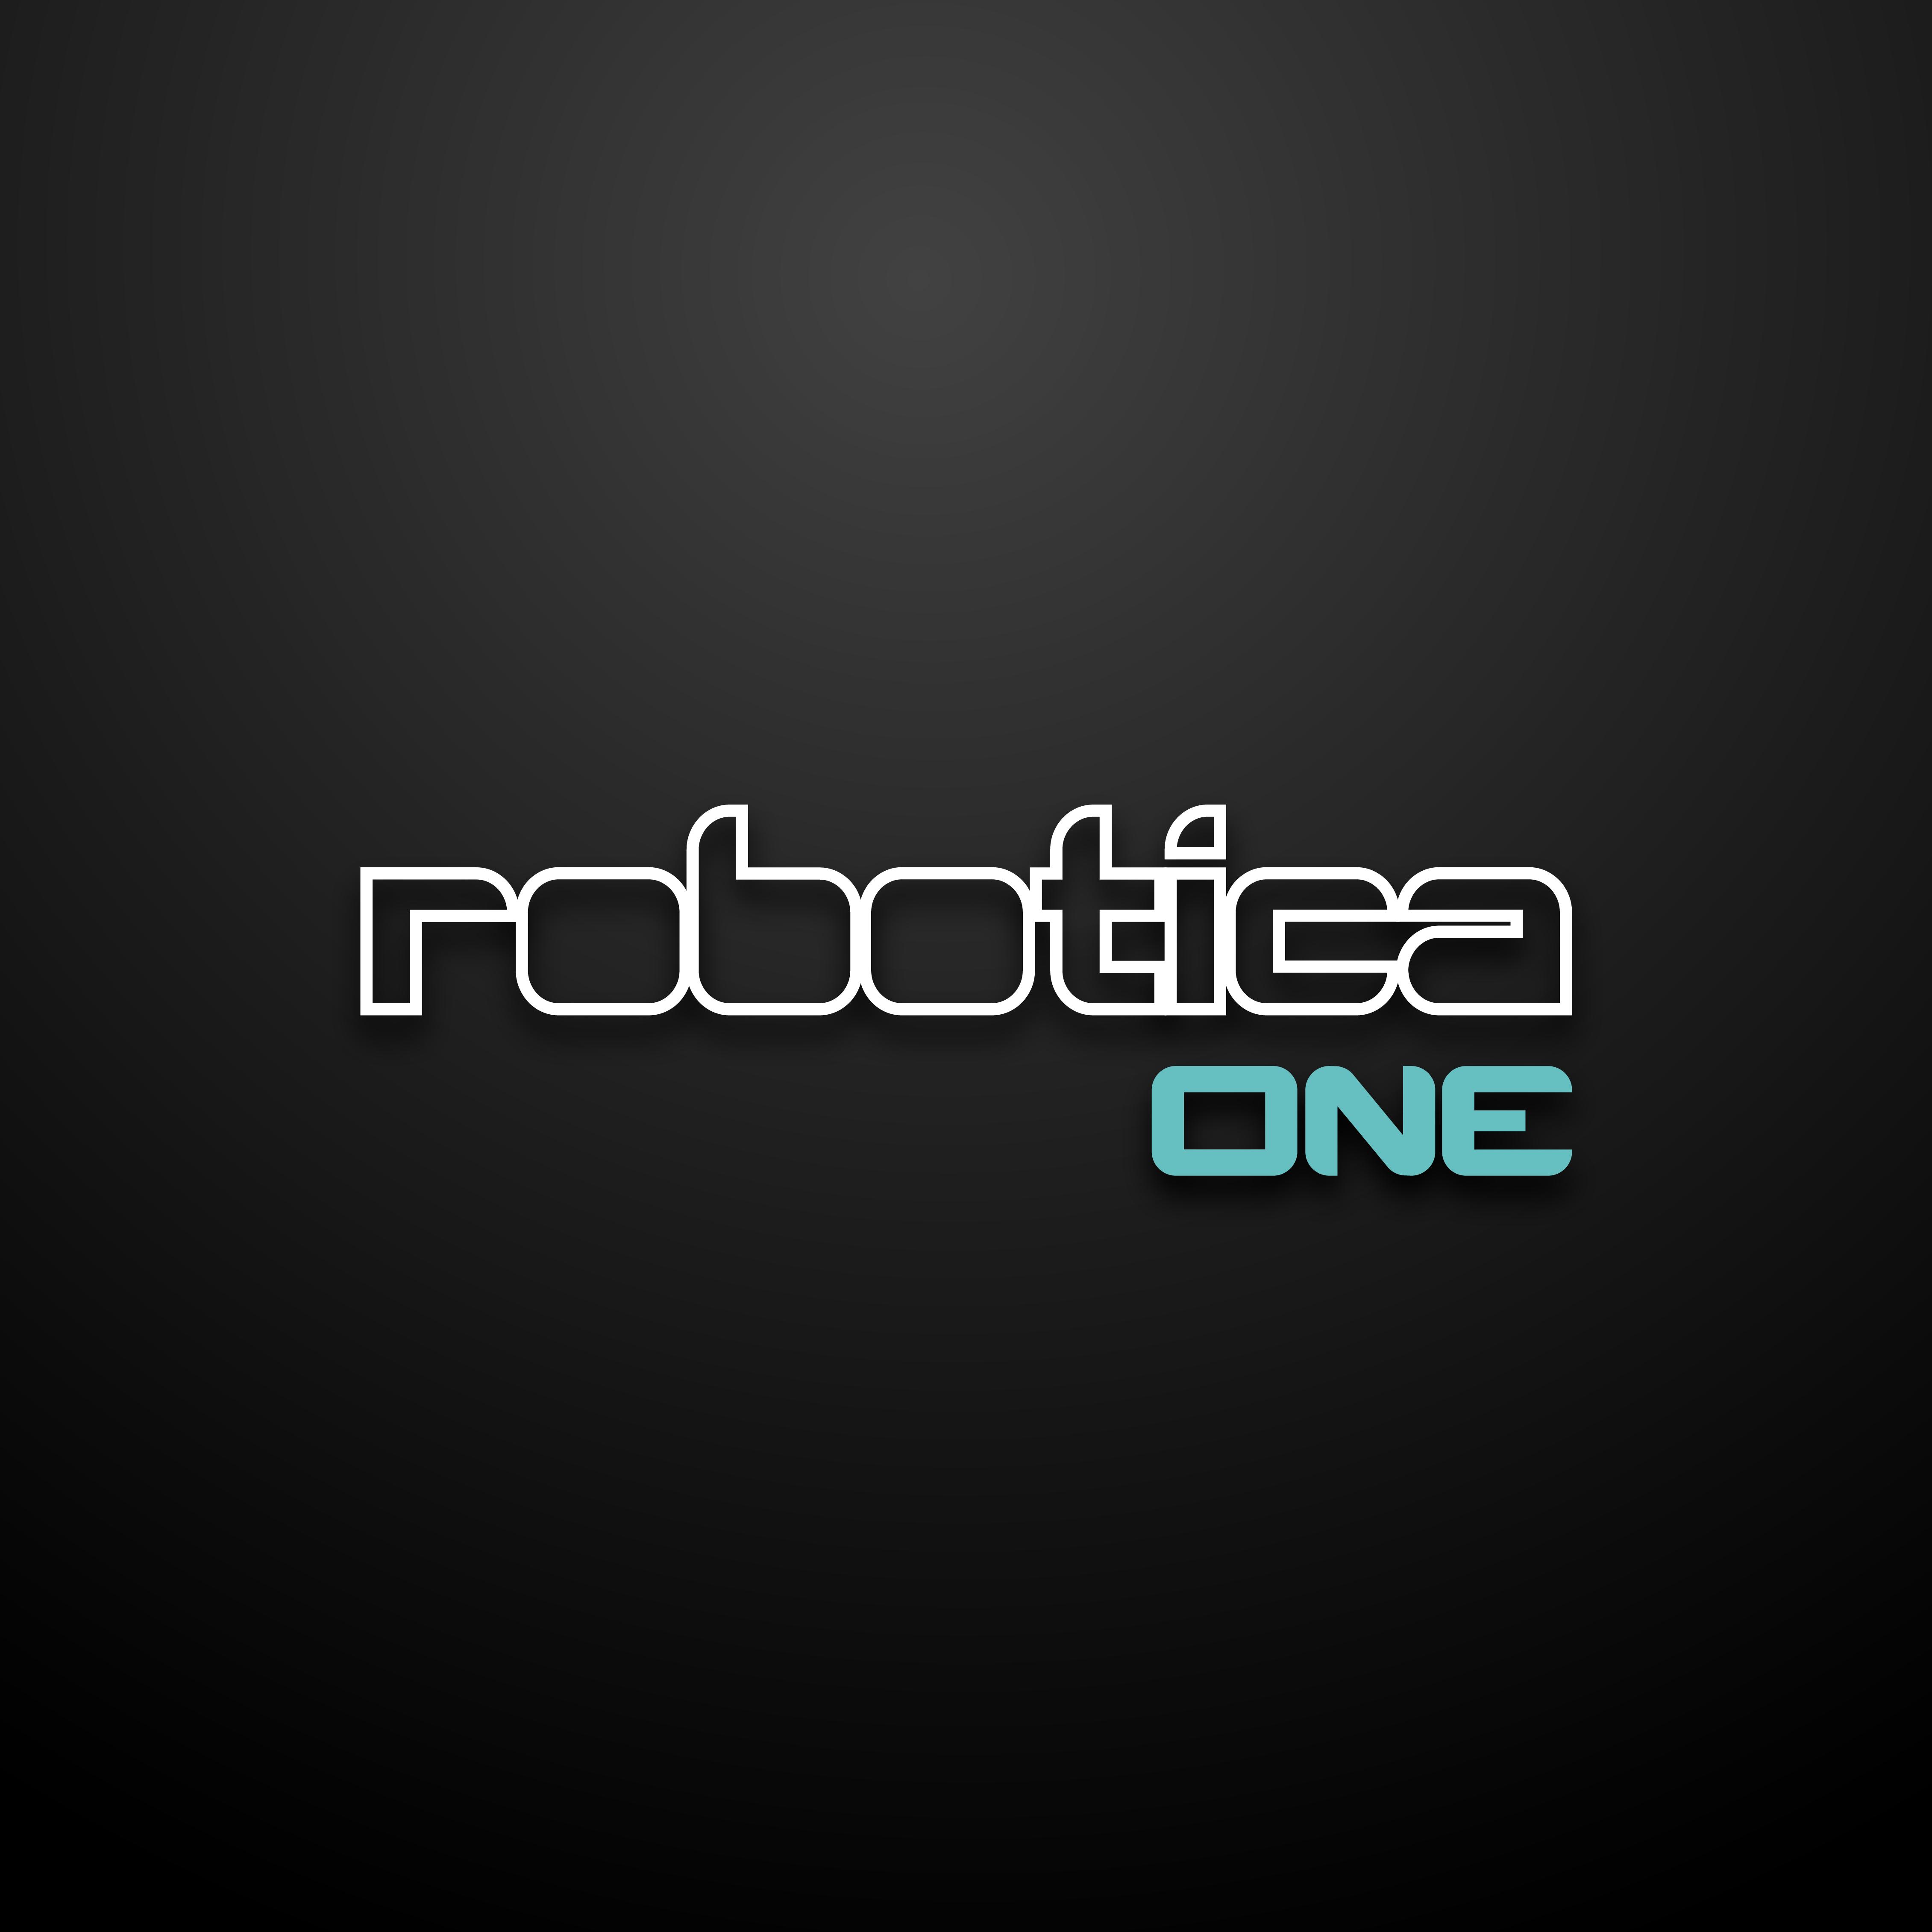 Robotica One